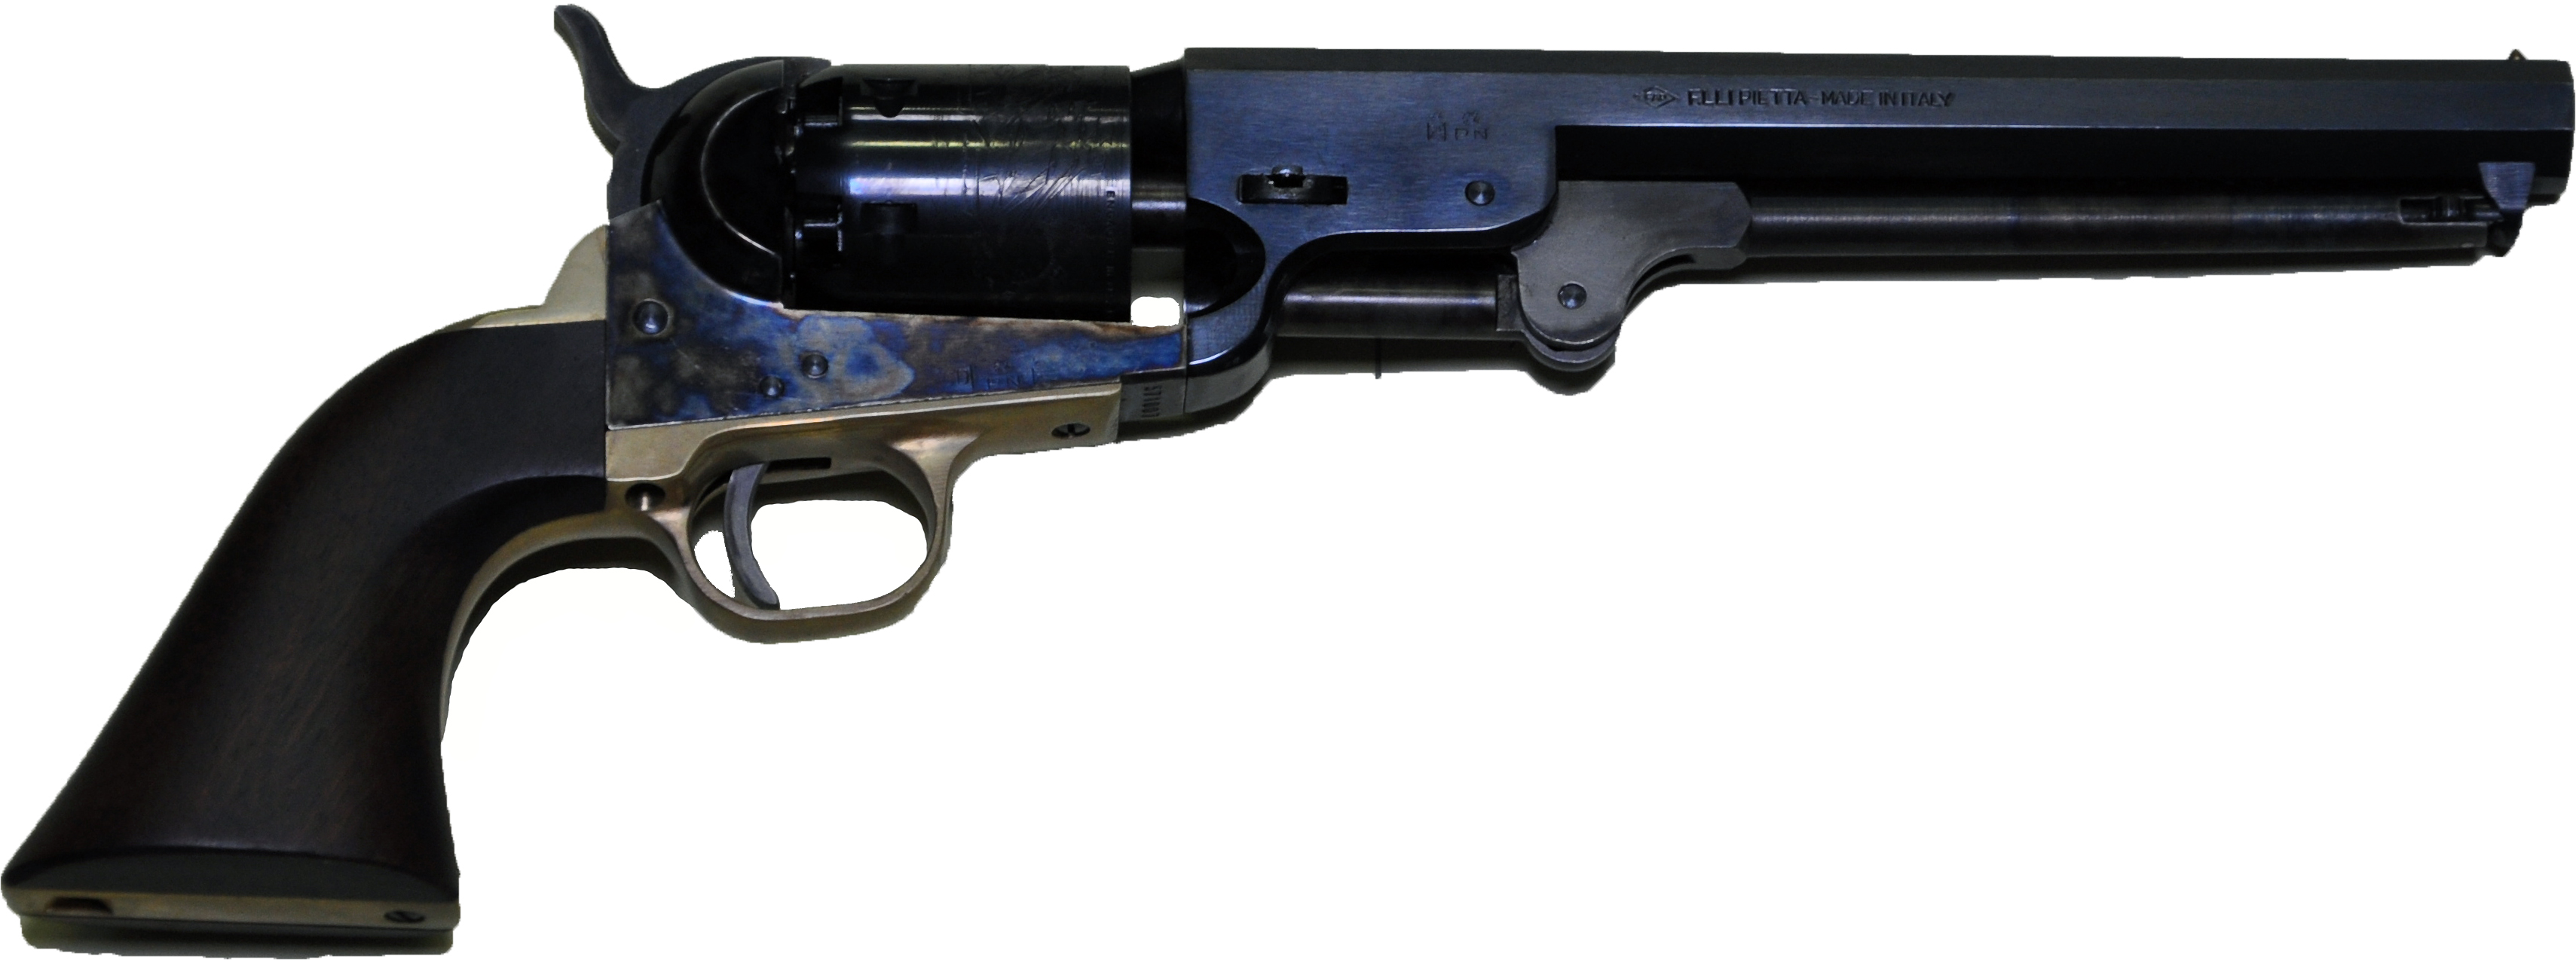 Colt Revolver 1851 1851 Colt Revolver